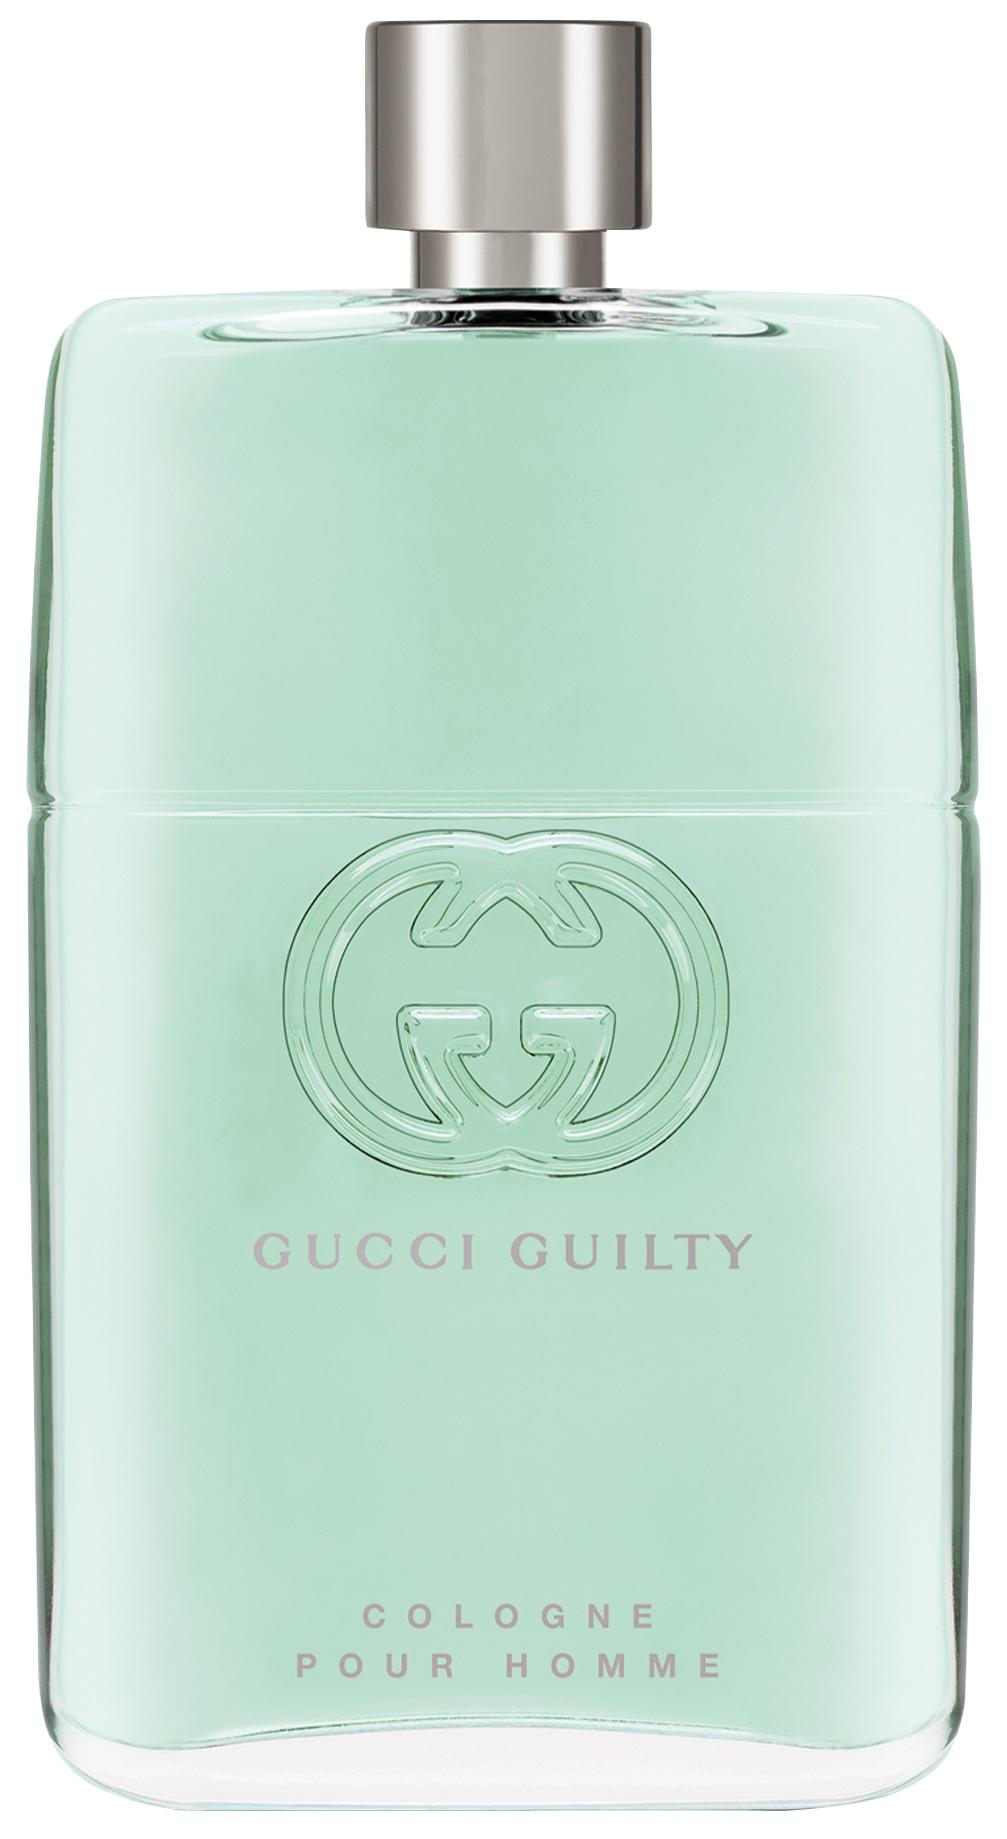 Мужская парфюмерия GUCCI GUILTY COLOGNE 150 мл